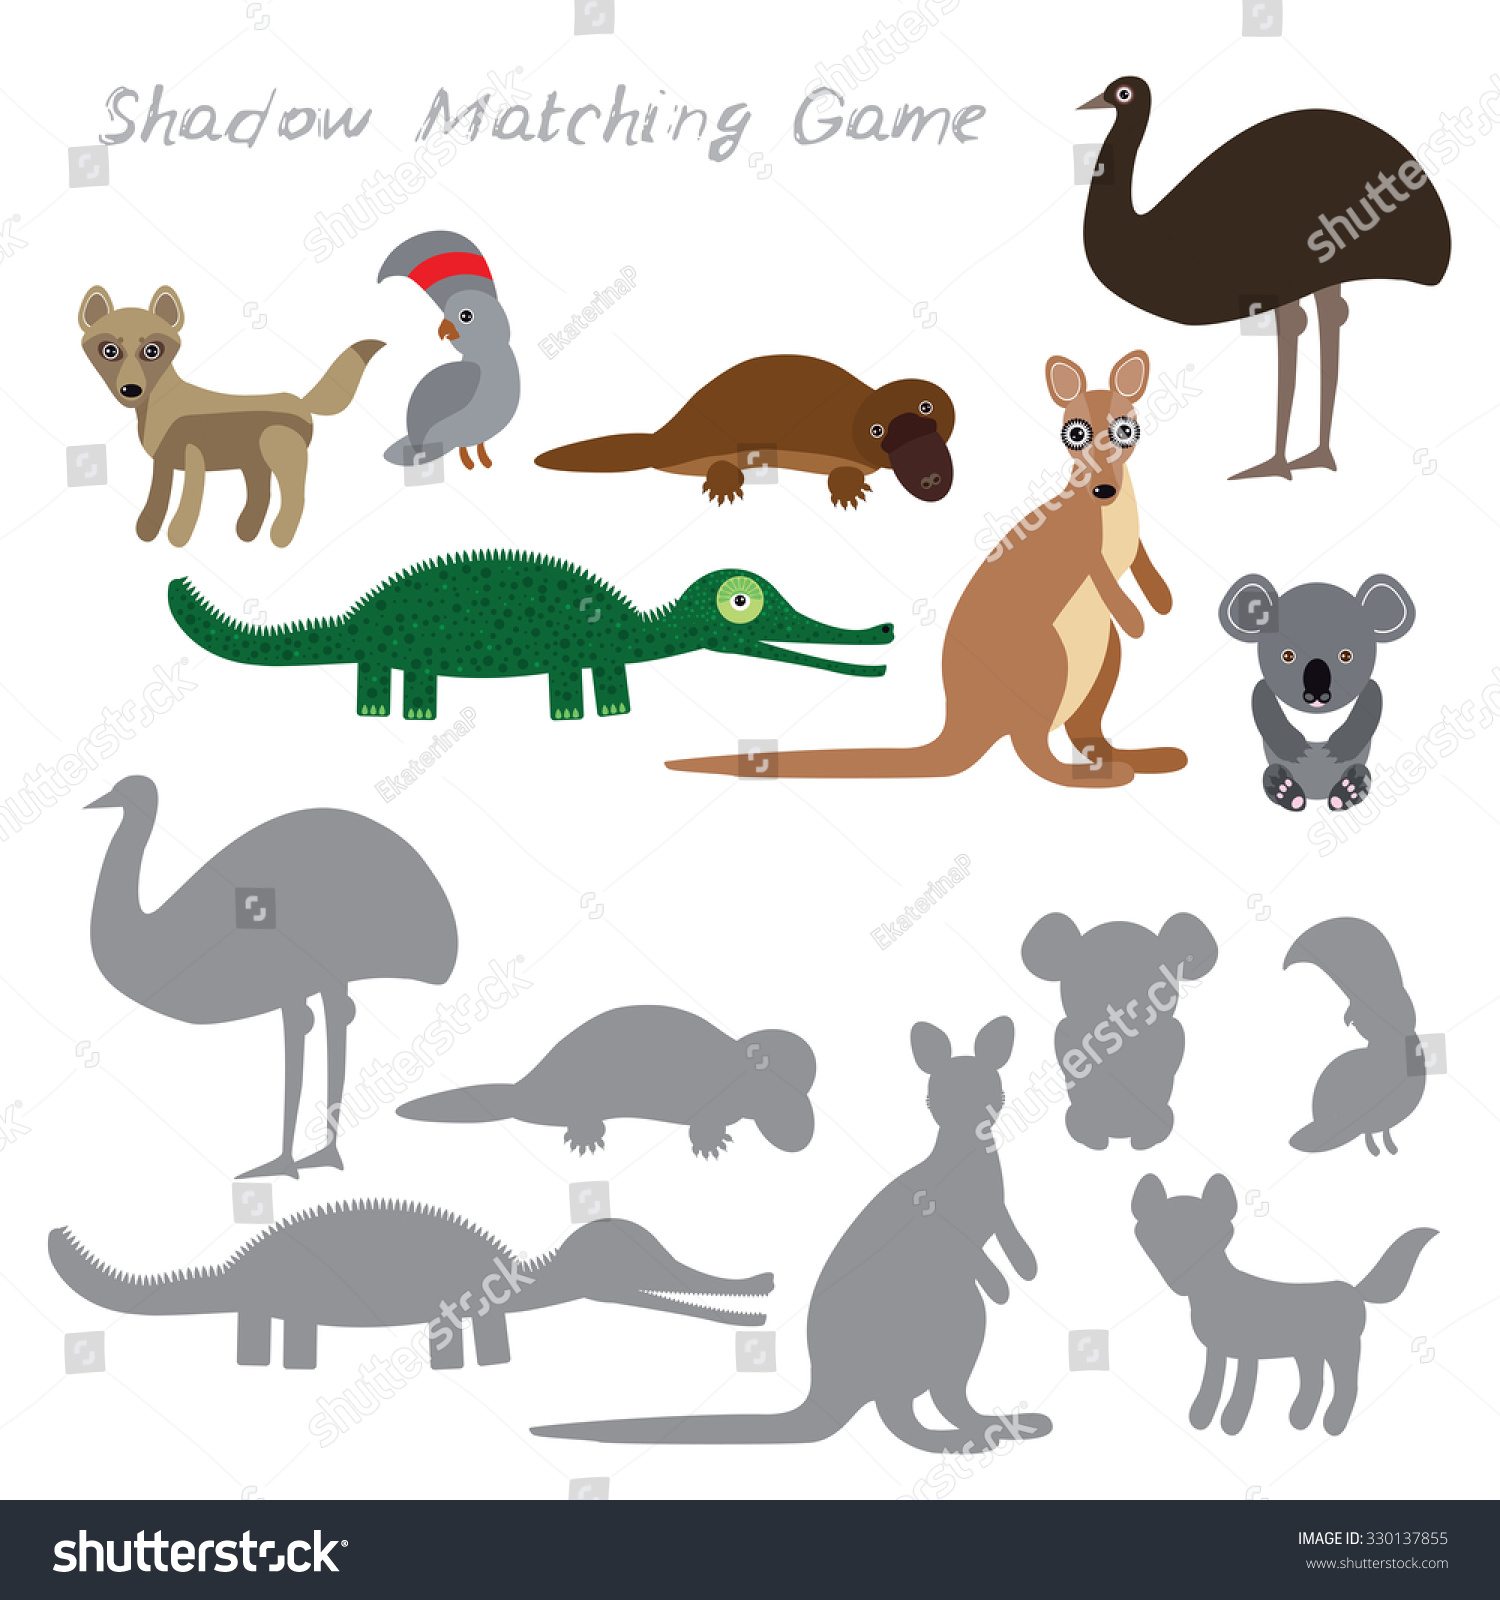 Australian Animals Dingo Emu Parrot Crocodile Koala Kangaroo Platypus Isolated On White